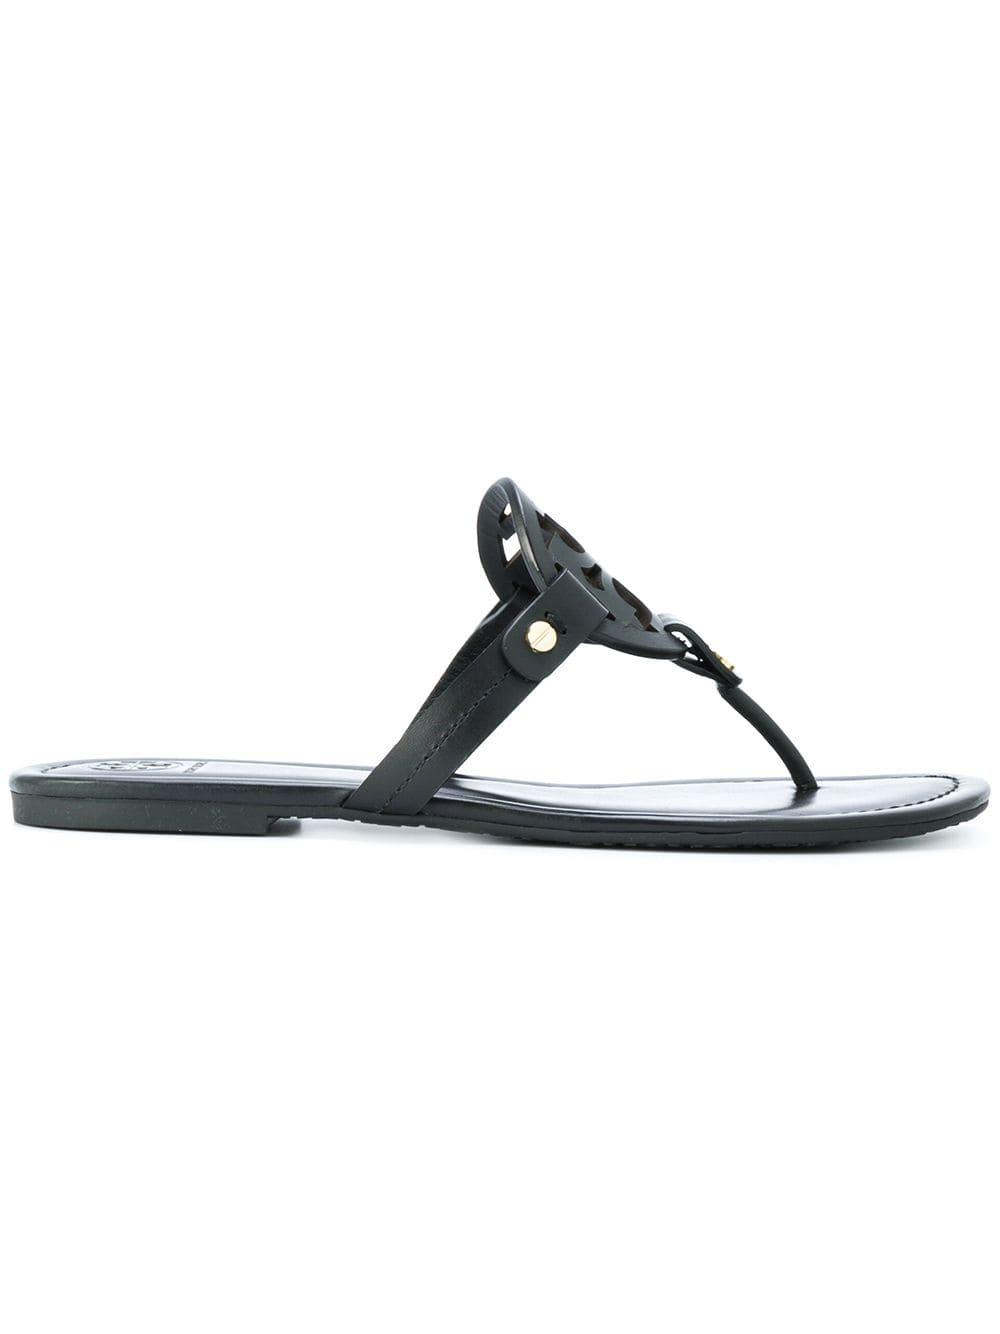 1e55d8a483b Lyst - Tory Burch Miller Leather Sandals in Black